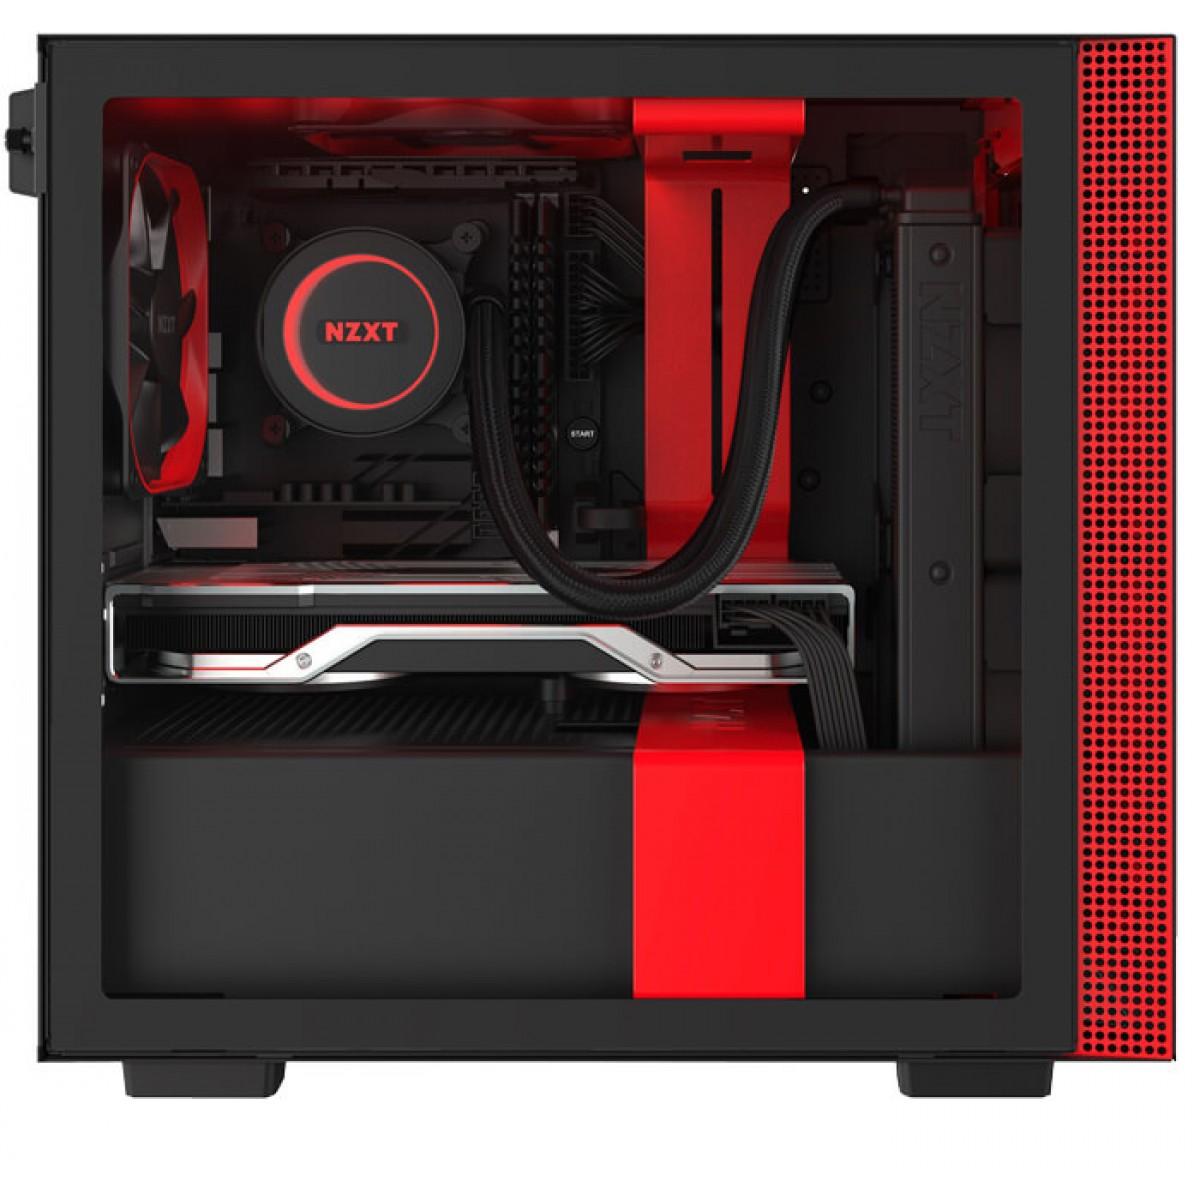 Gabinete Gamer NZXT H210i, Mini Tower, Vidro Temperado, Red, Sem Fonte, Com 2 Fans, CA-H210I-BR